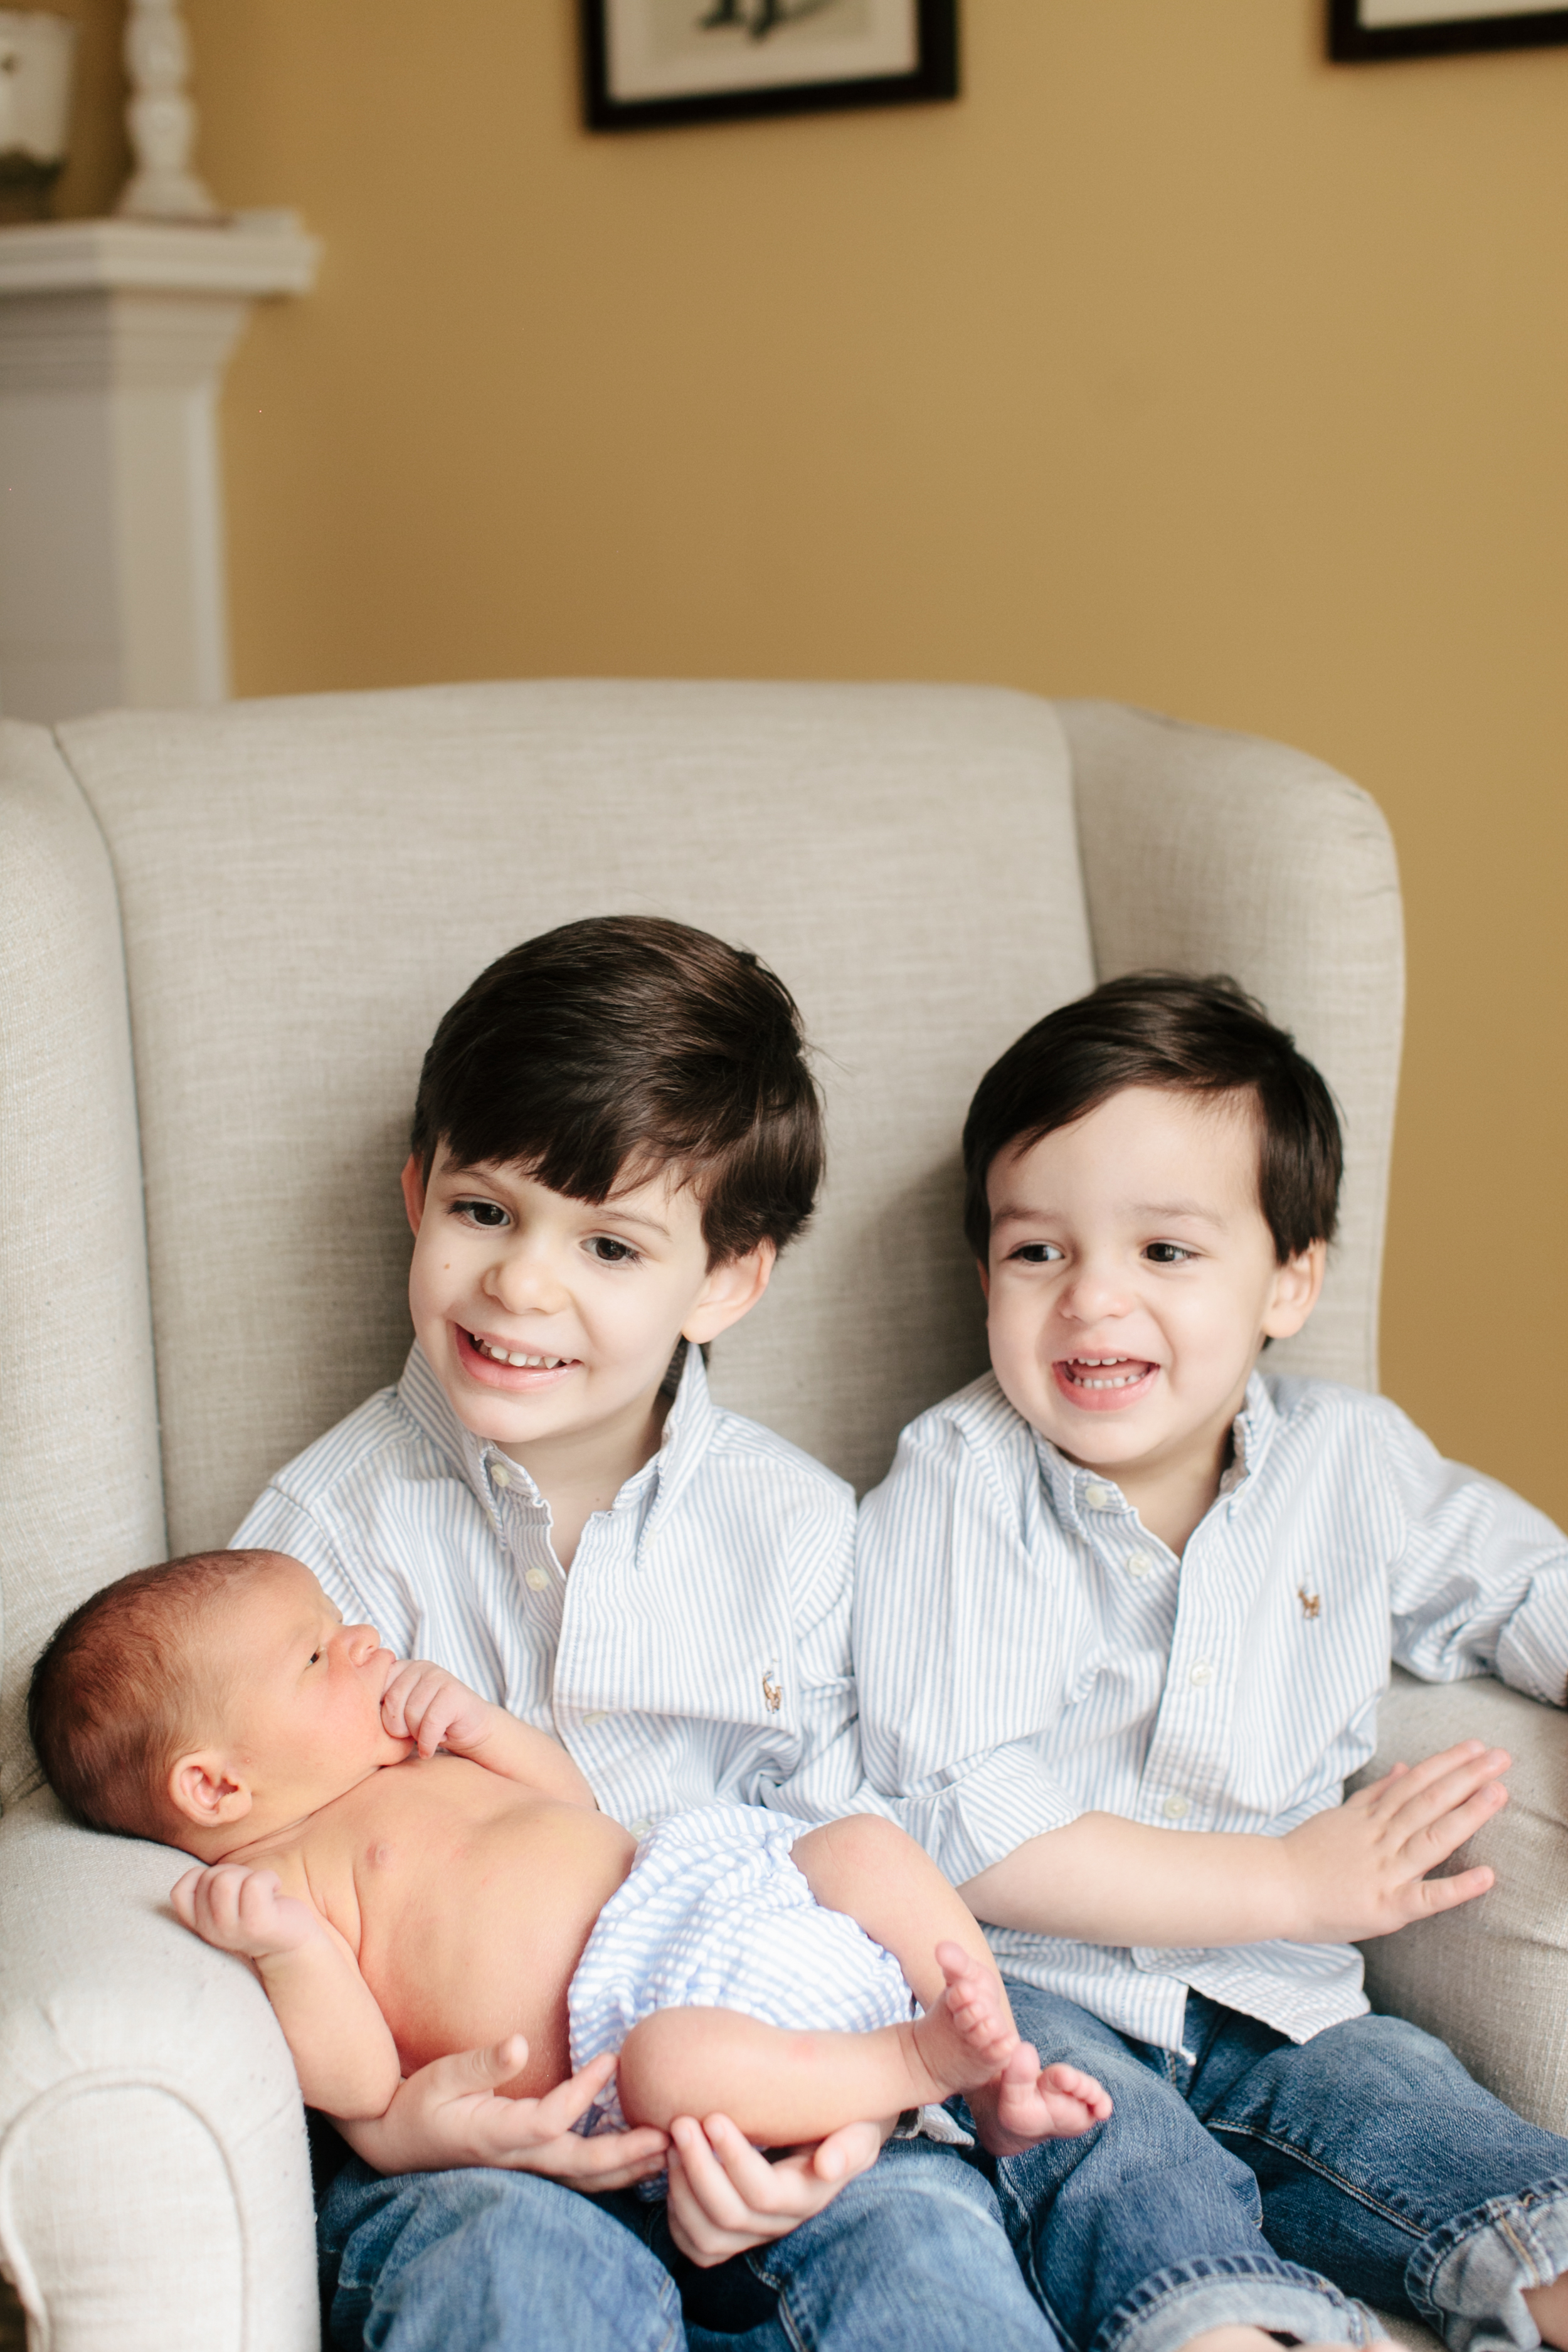 Atlanta-Newborn-and-Family-Photographer-Kathryn-McCrary-Photography-Makris-23.jpg